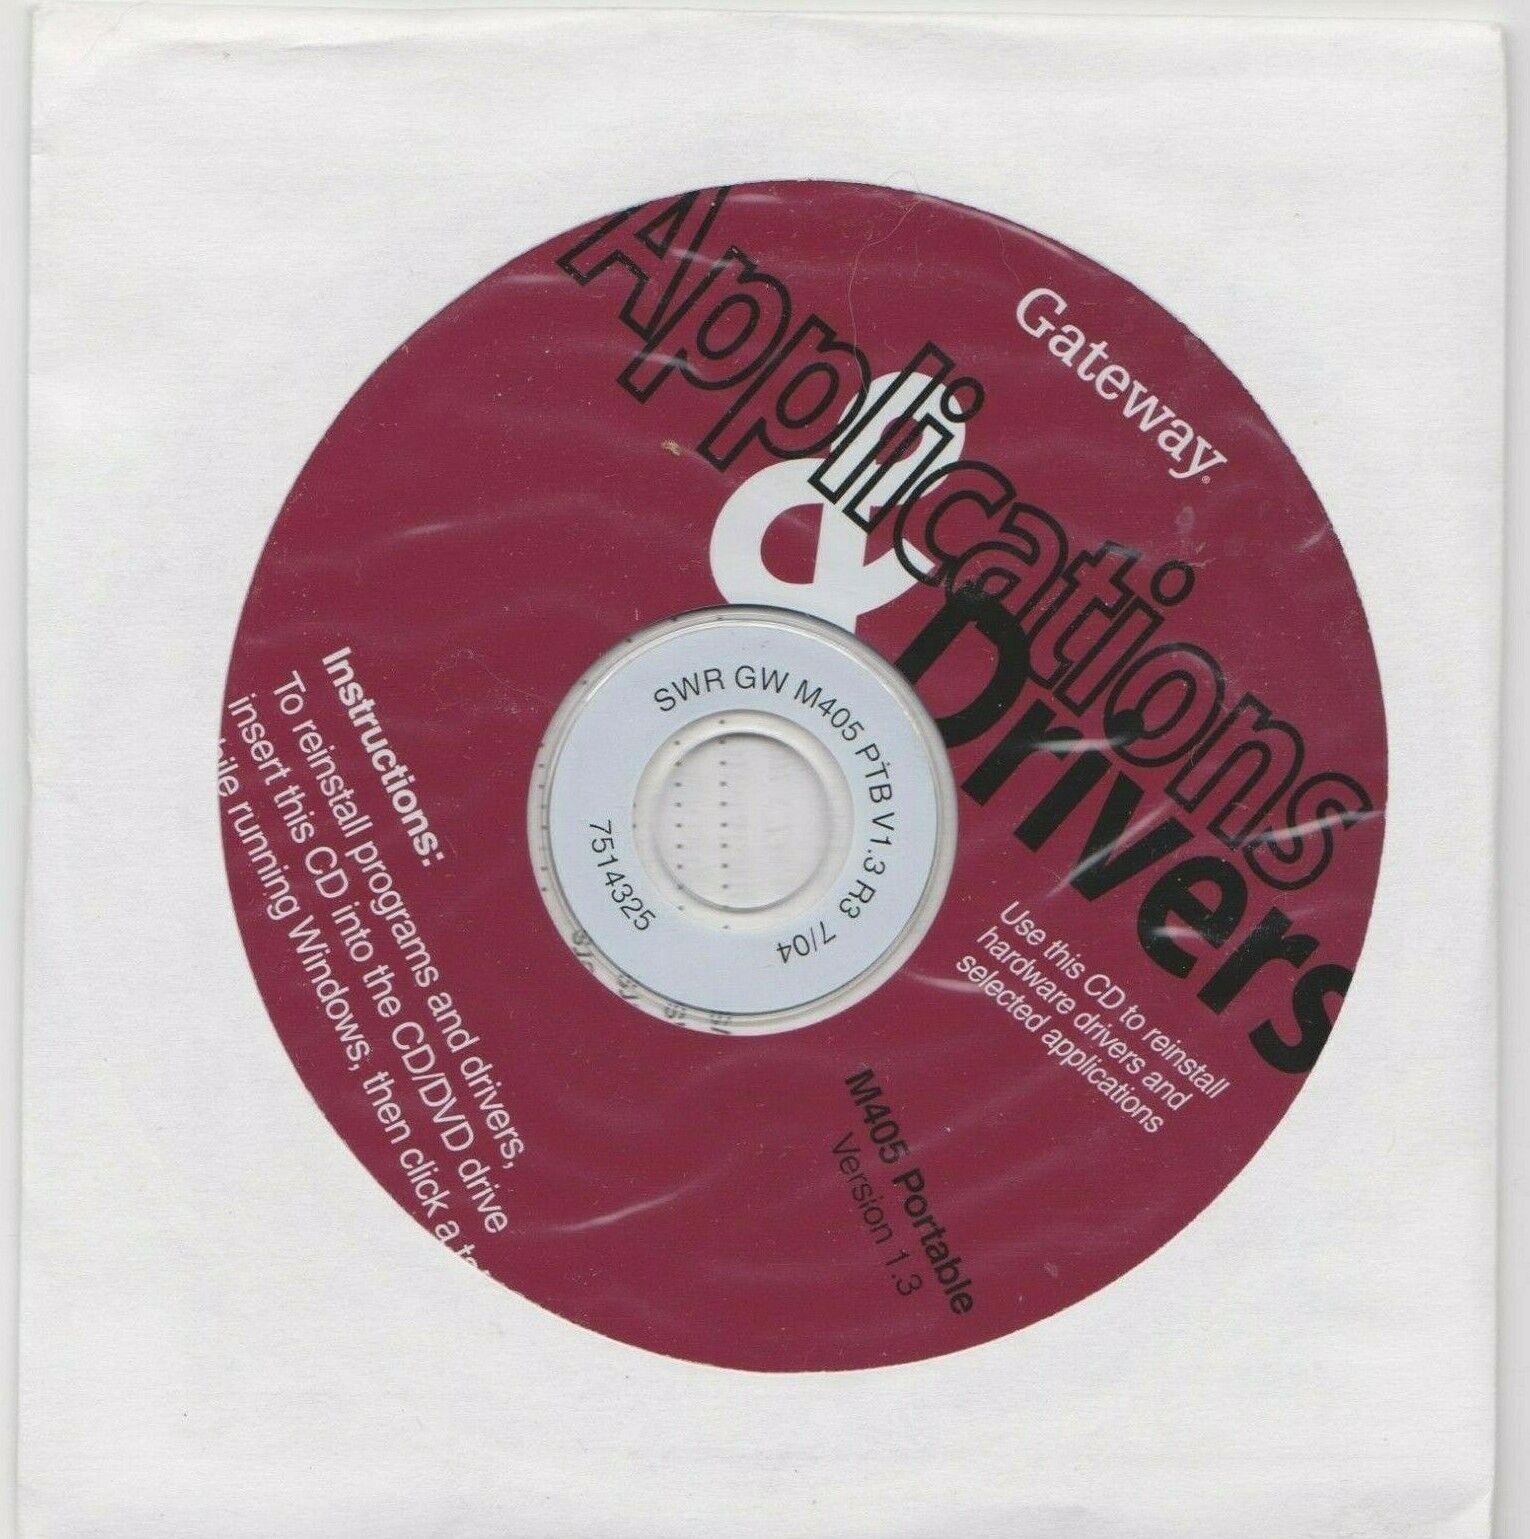 Gateway Application & Drivers M405 Series CD V1.3 7514325 Sealed